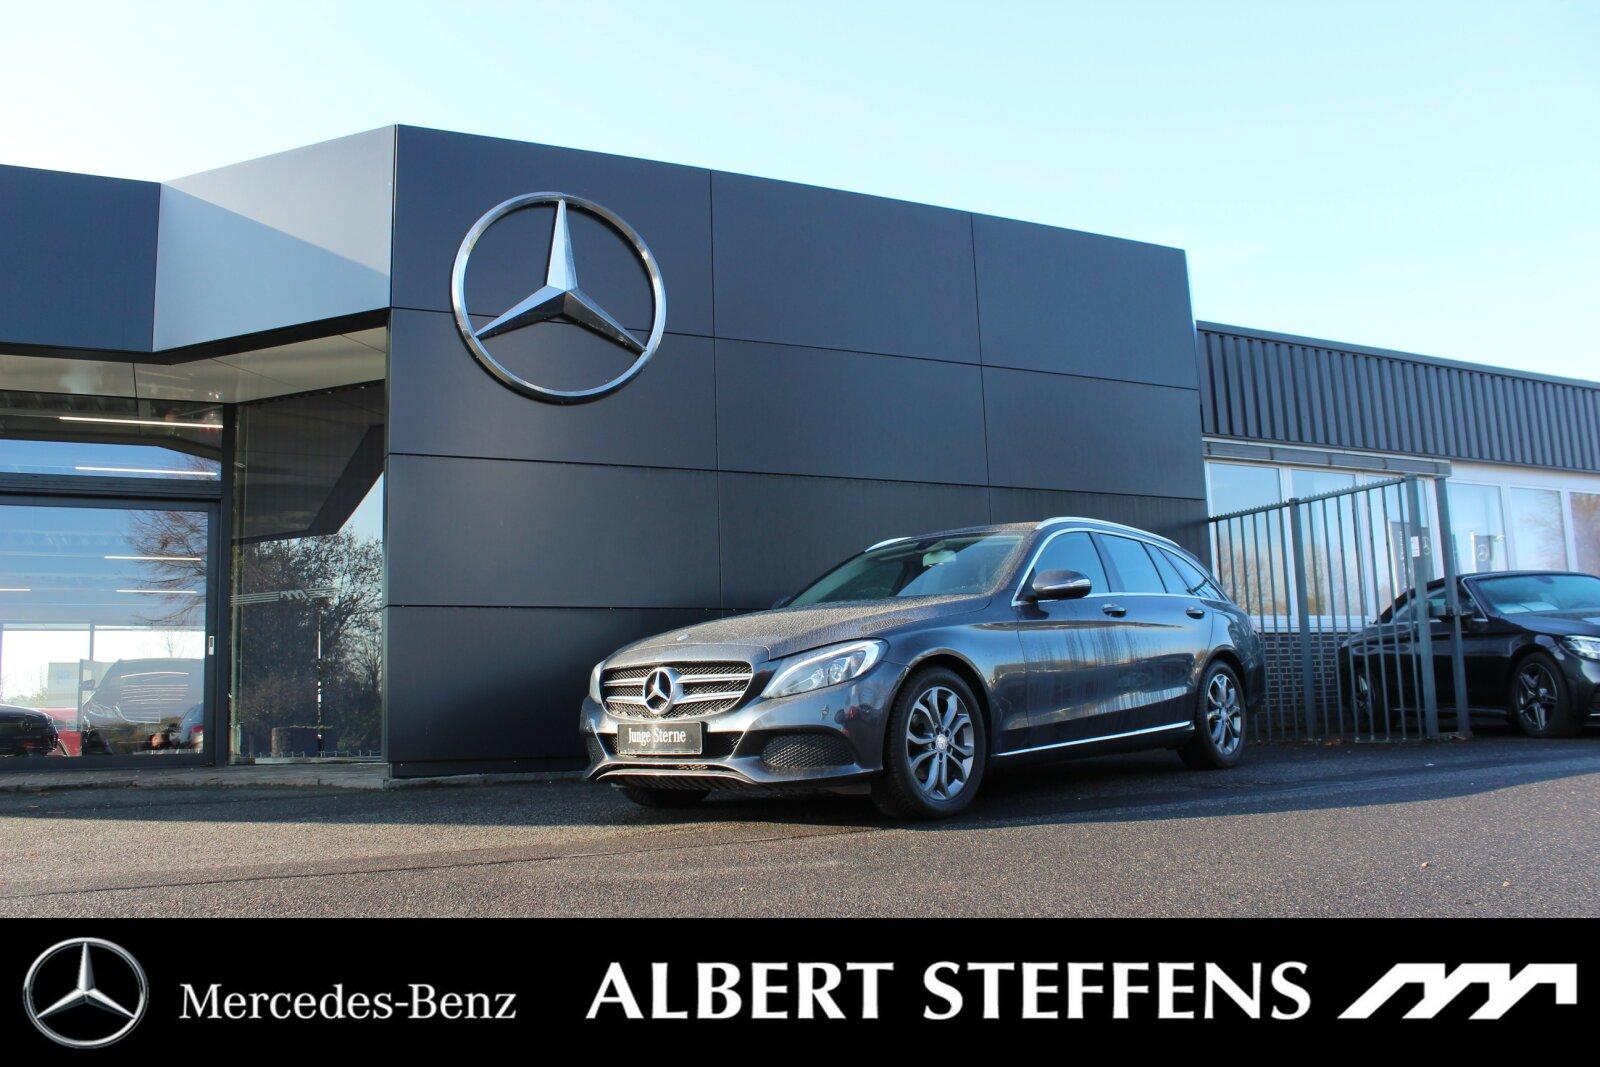 Mercedes-Benz C 200 d T Avantgarde AHK+NAVI+SHZ+LED Navi/Klima, Jahr 2014, Diesel